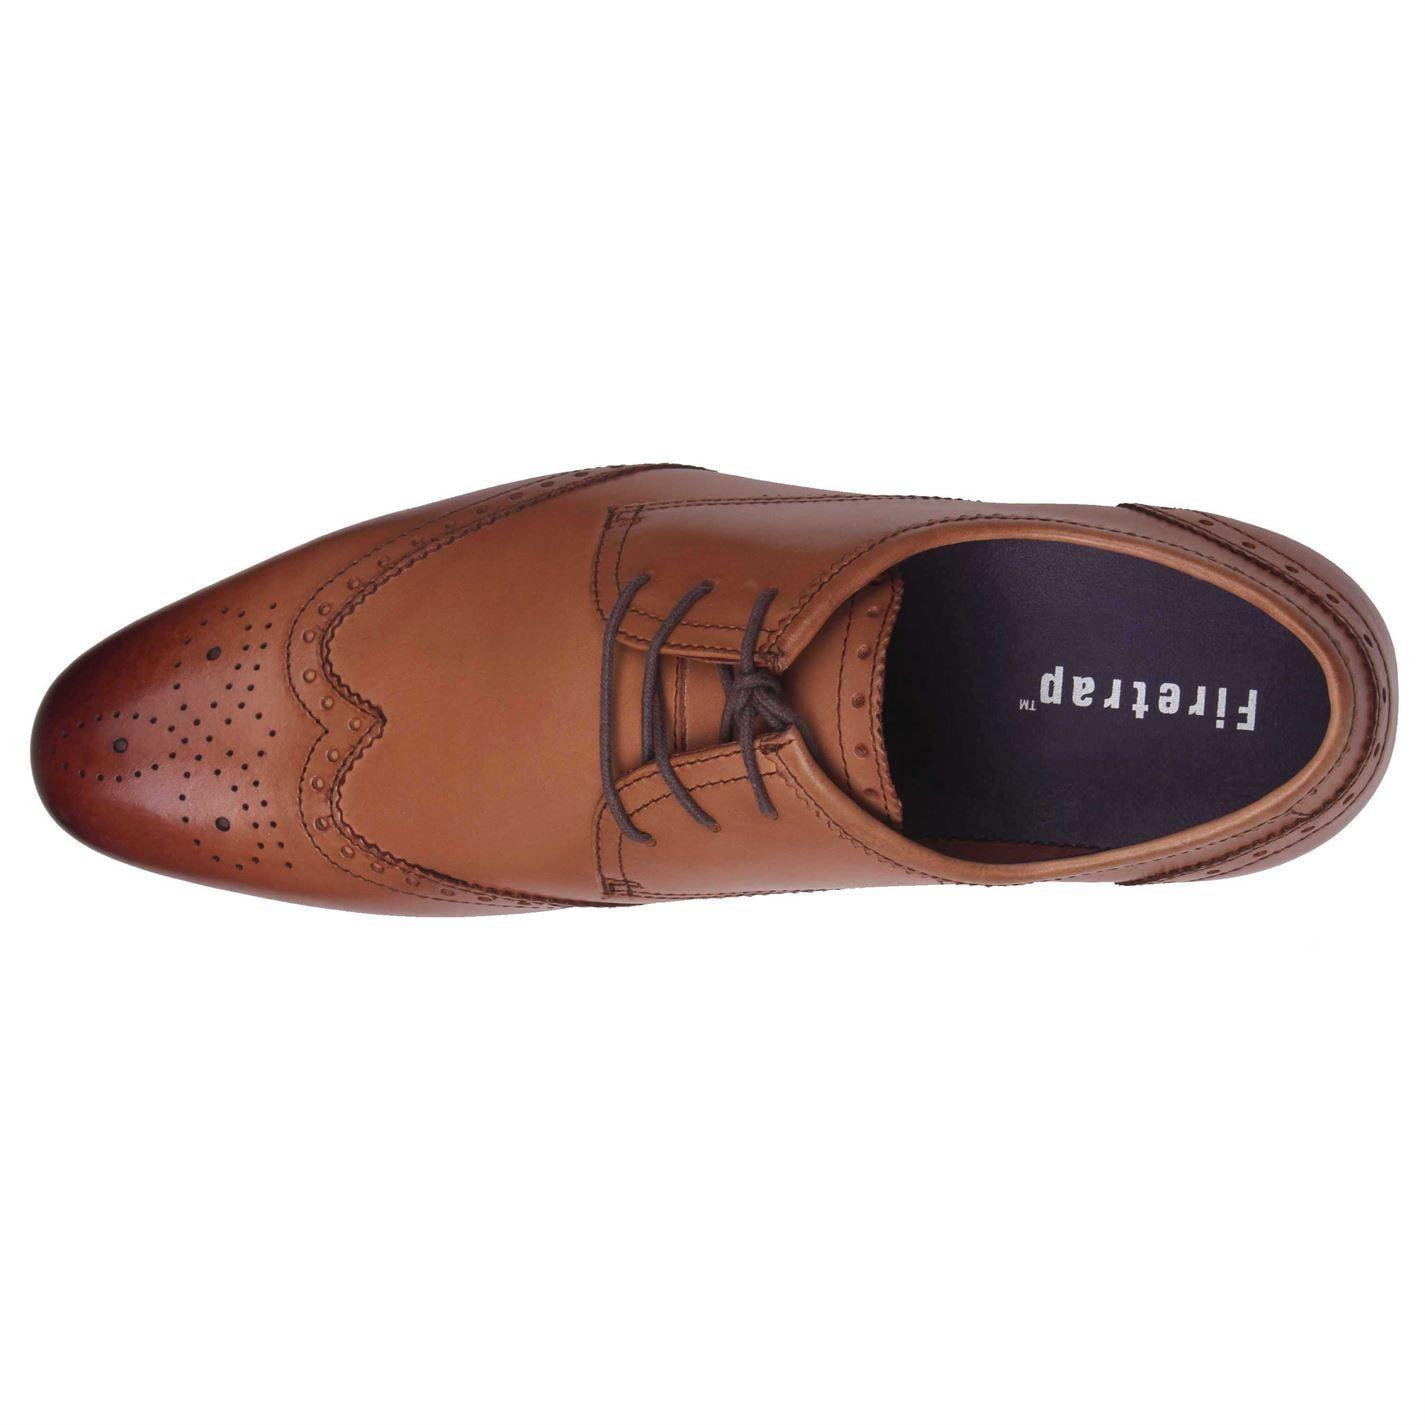 Firetrap Mens Beaufort Lace Up Brogue Style Slight Heel Smart Formal Shoes